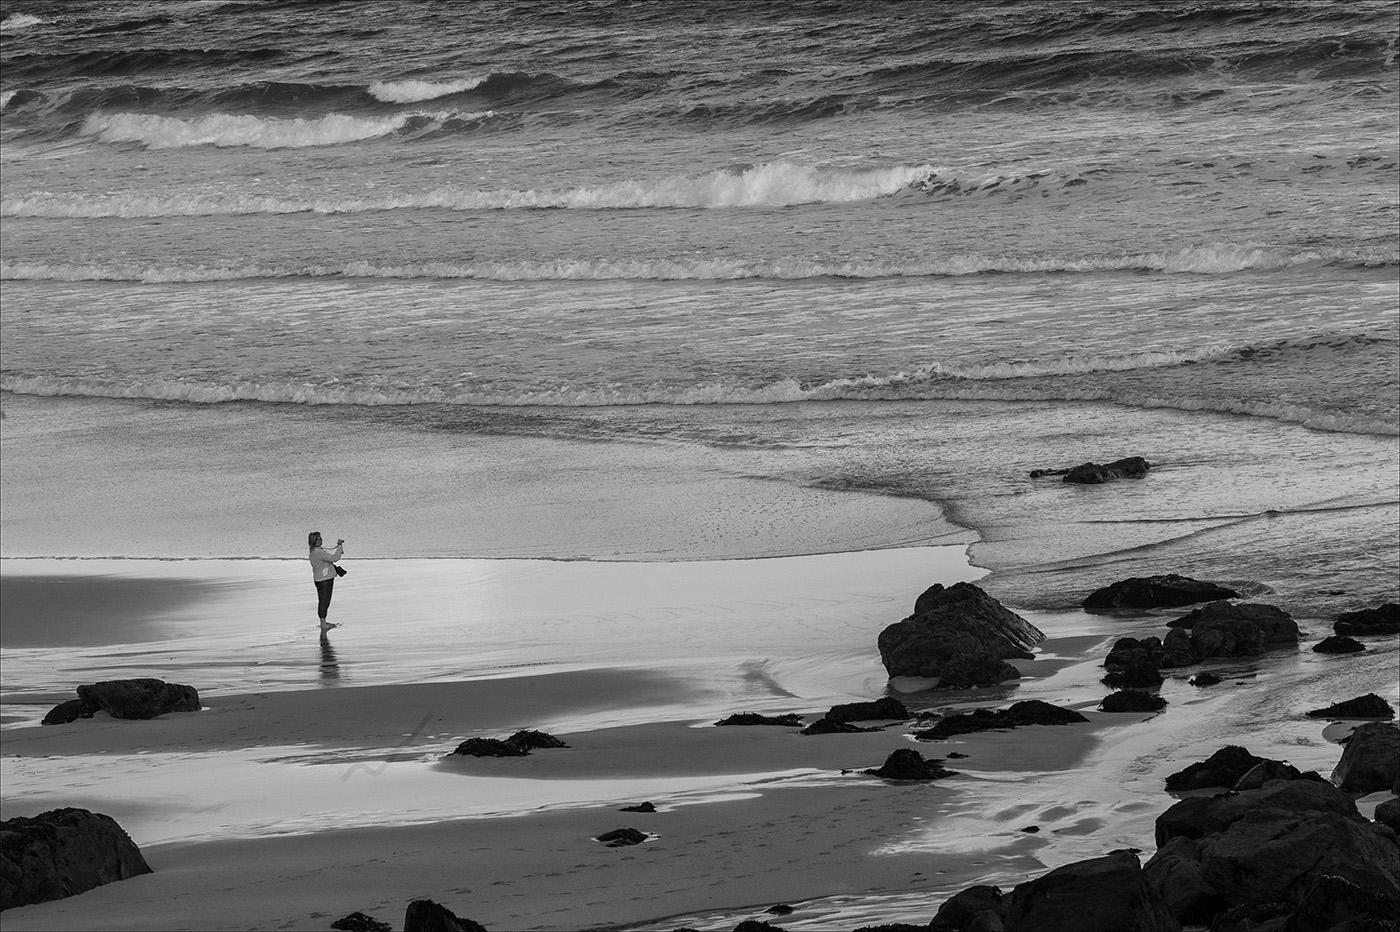 Morning photographer